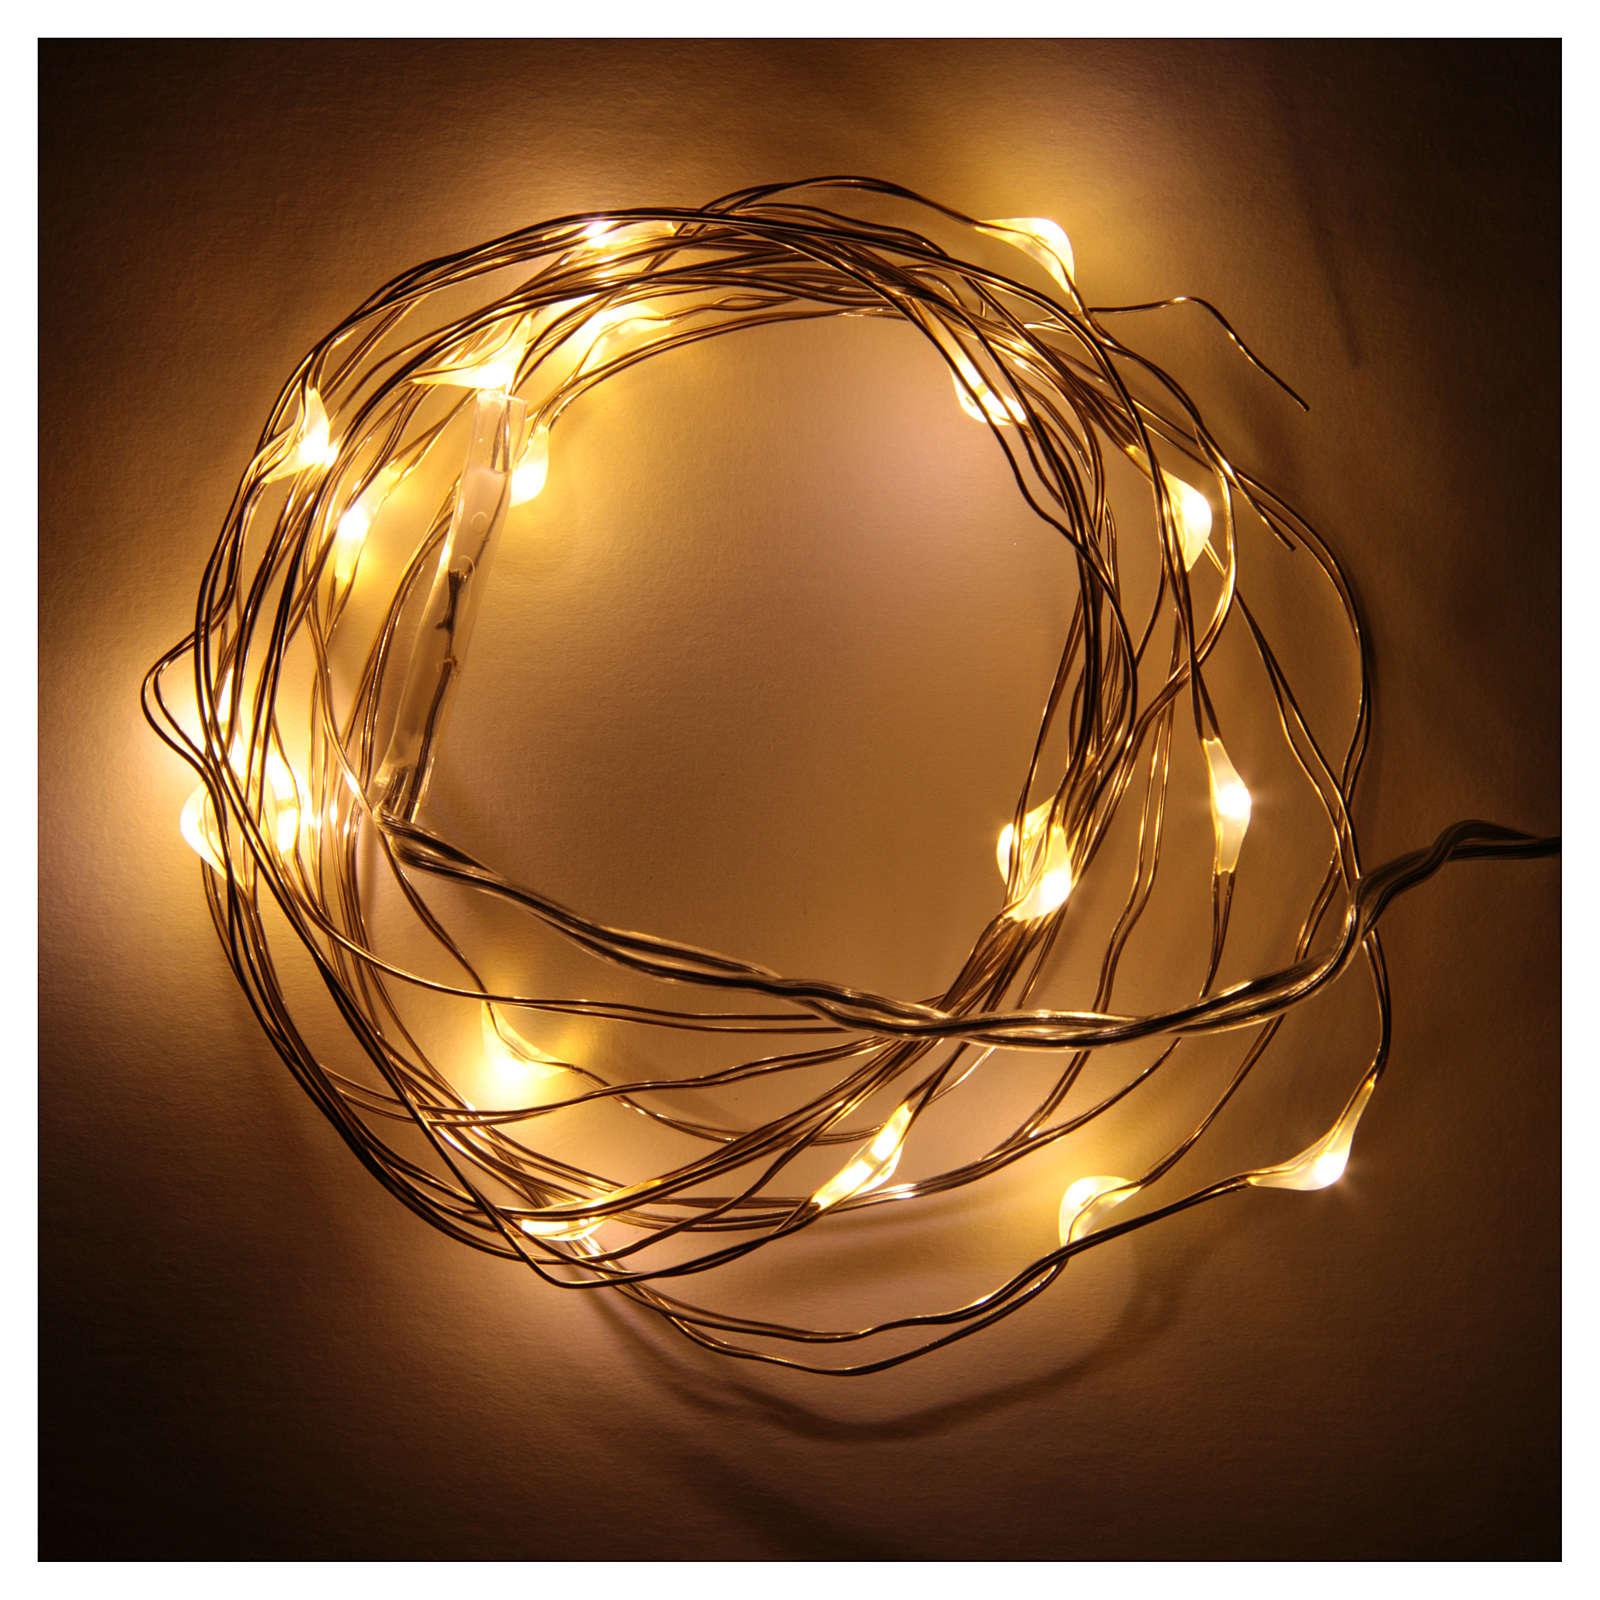 Luce natalizia 20 luci led goccia bianca calda batteria filo nudo 3